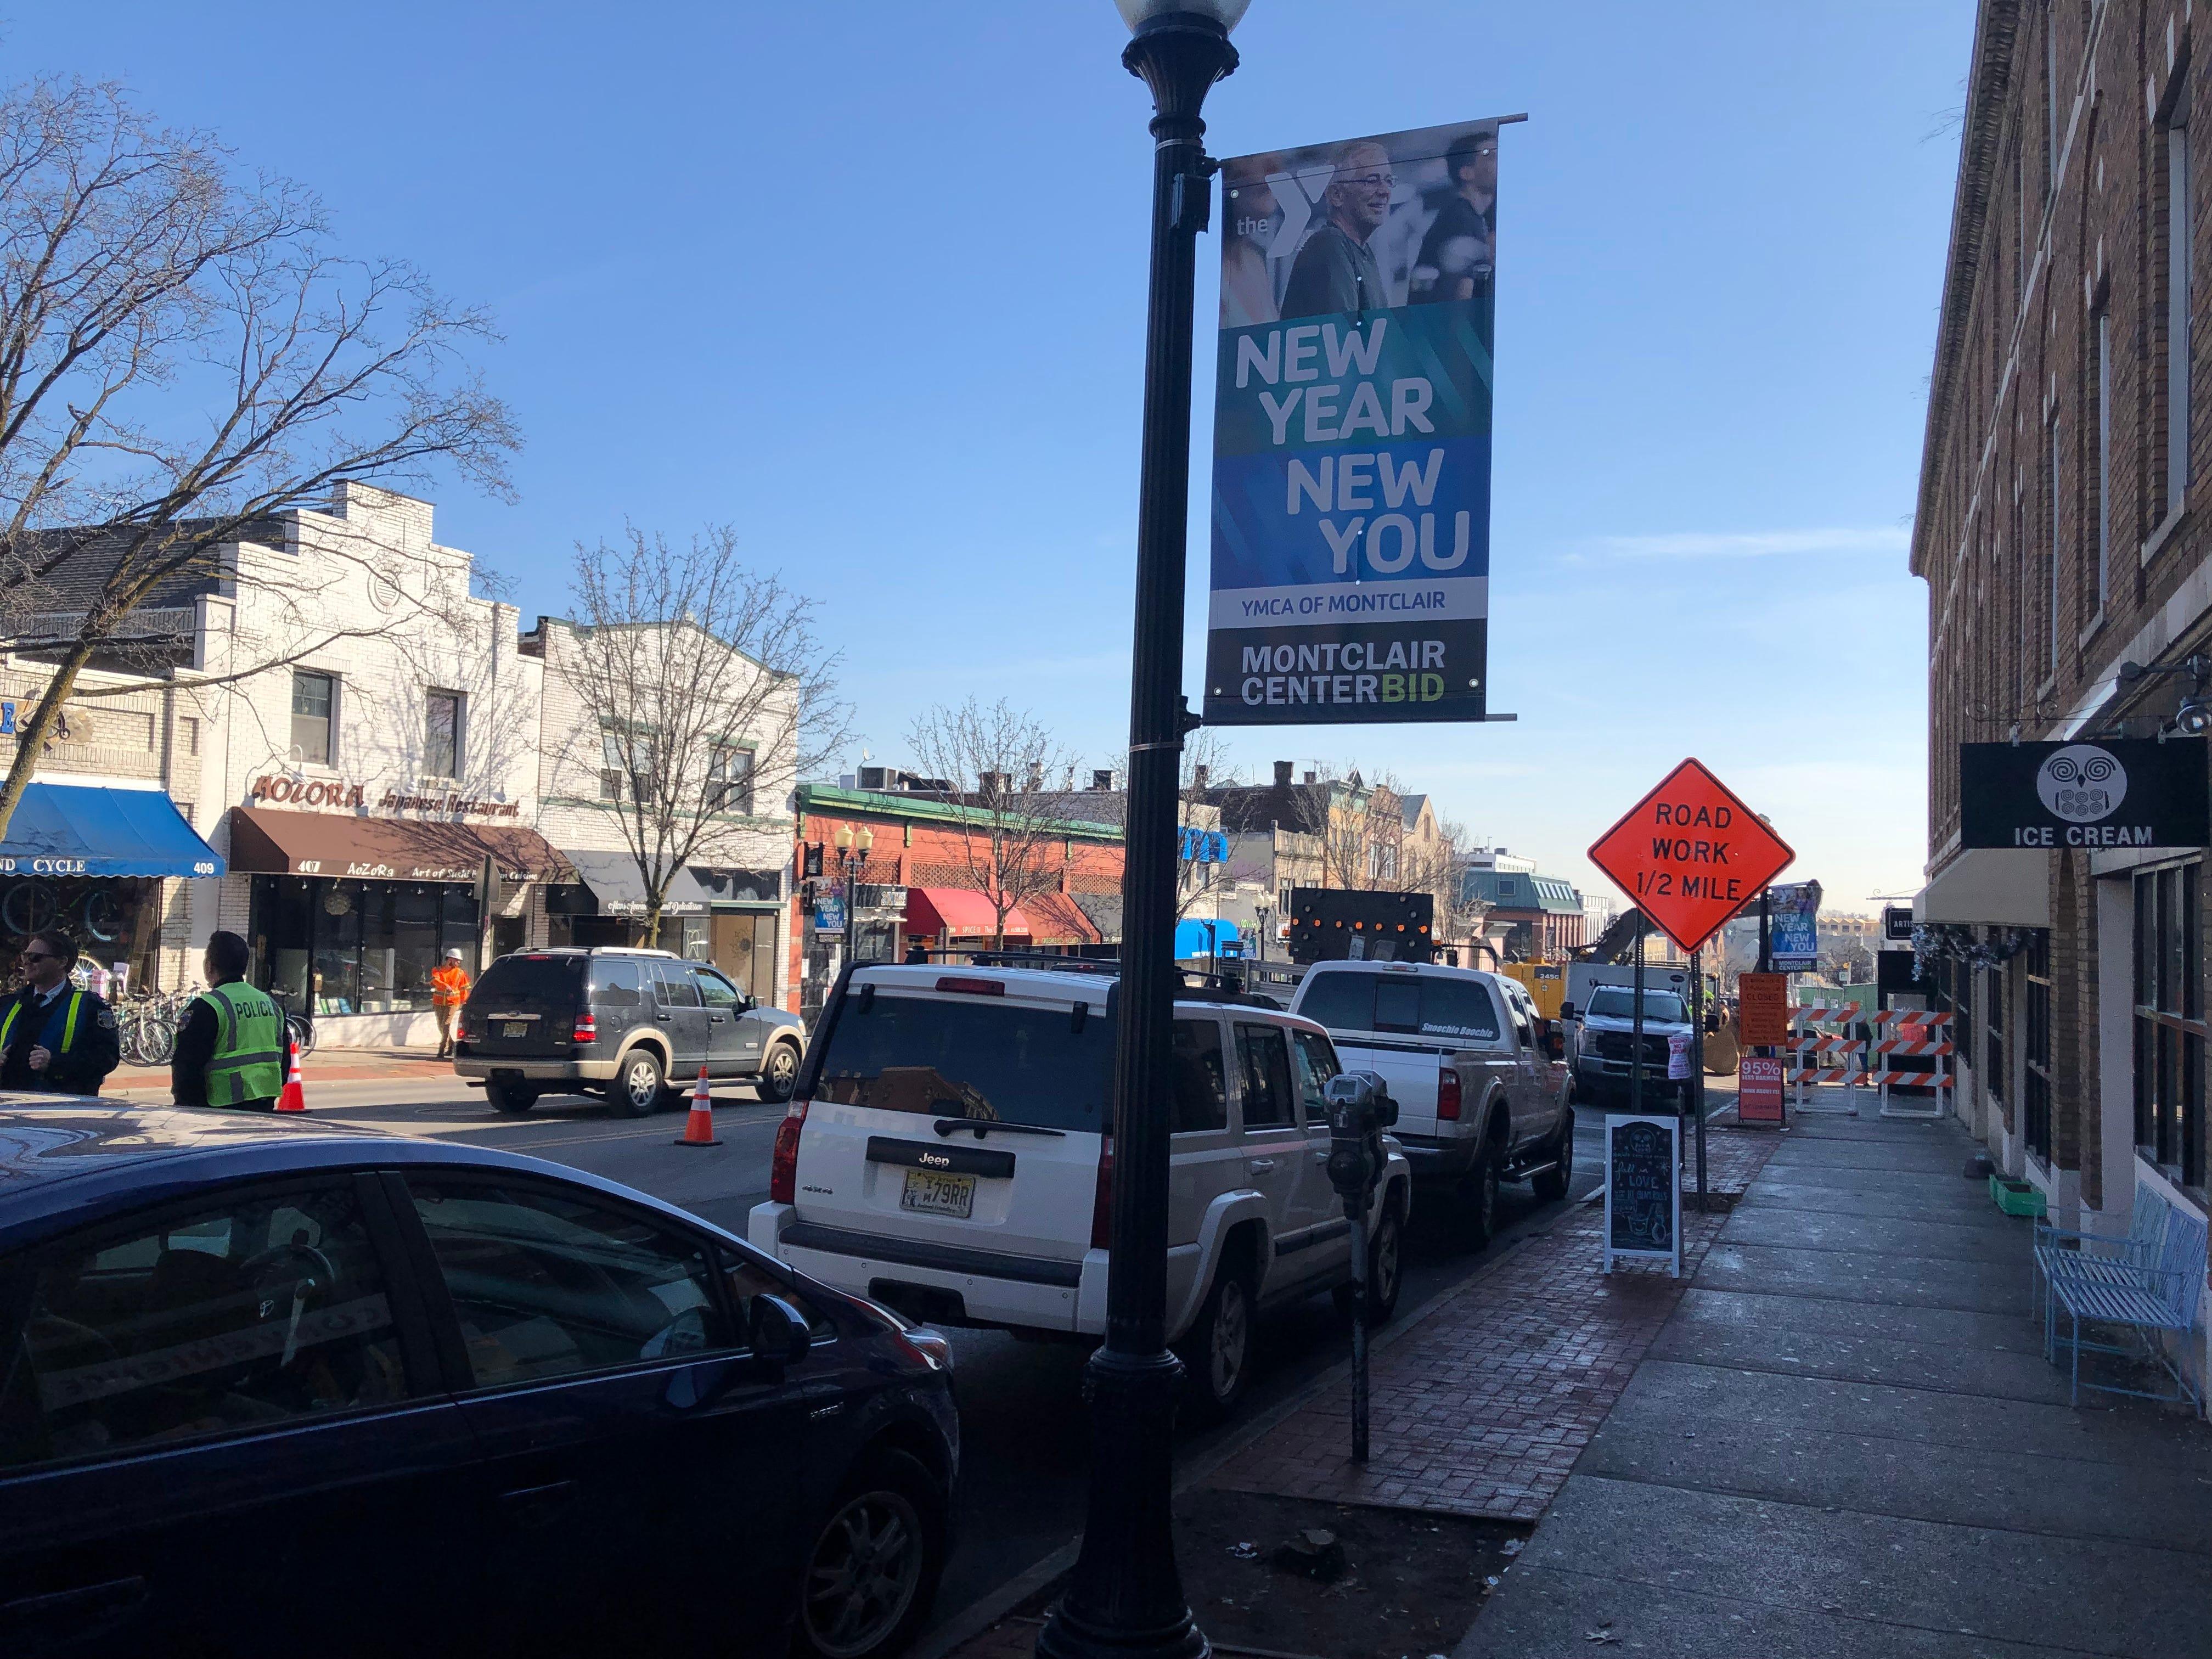 Bloomfield Avenue in Montclair near the Seymour Street redevelopment project. January 2019.